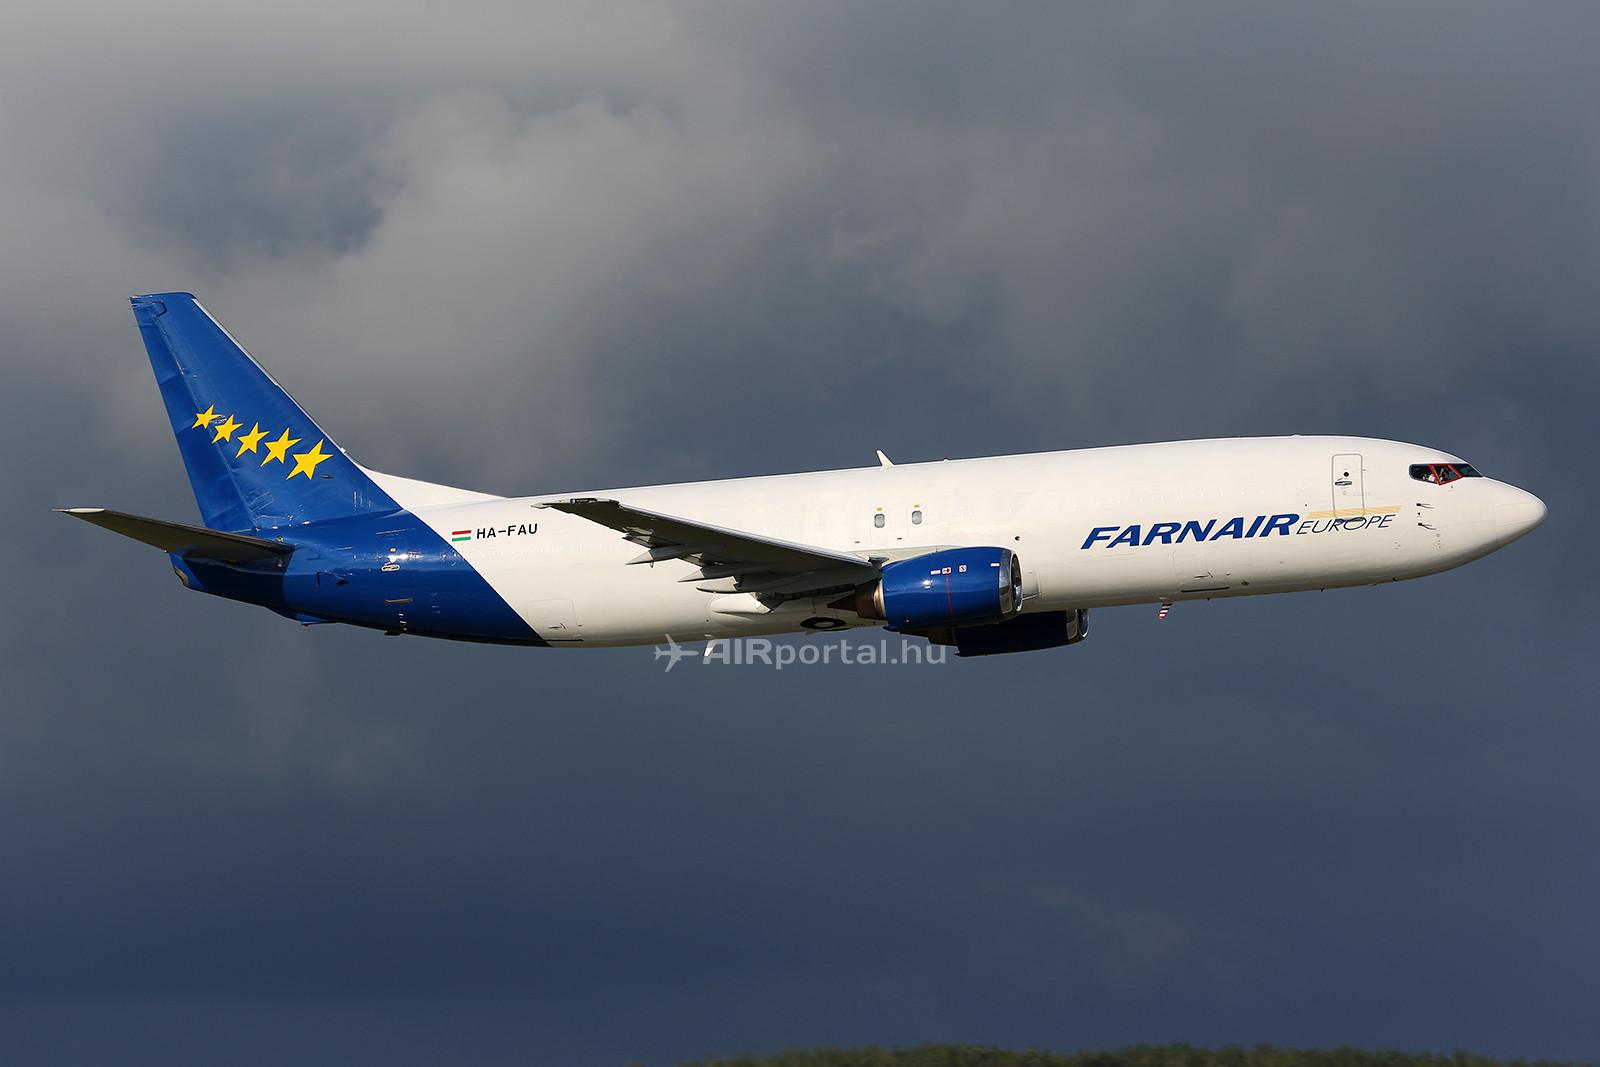 A második, HA-FAU lajstromjelű Boeing 737-400-as érkezése. (Fotó: AIRportal.hu) | © AIRportal.hu